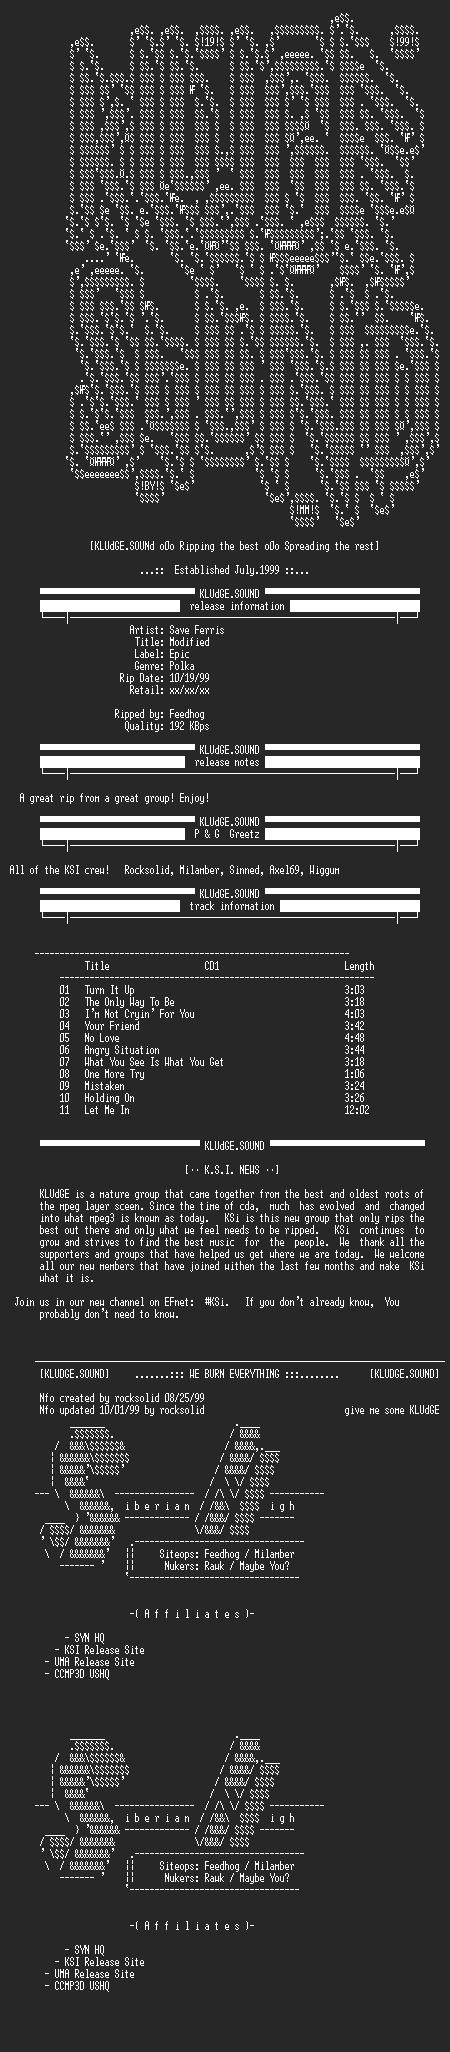 NFO file for Save_Ferris-Modified-1999-KSi